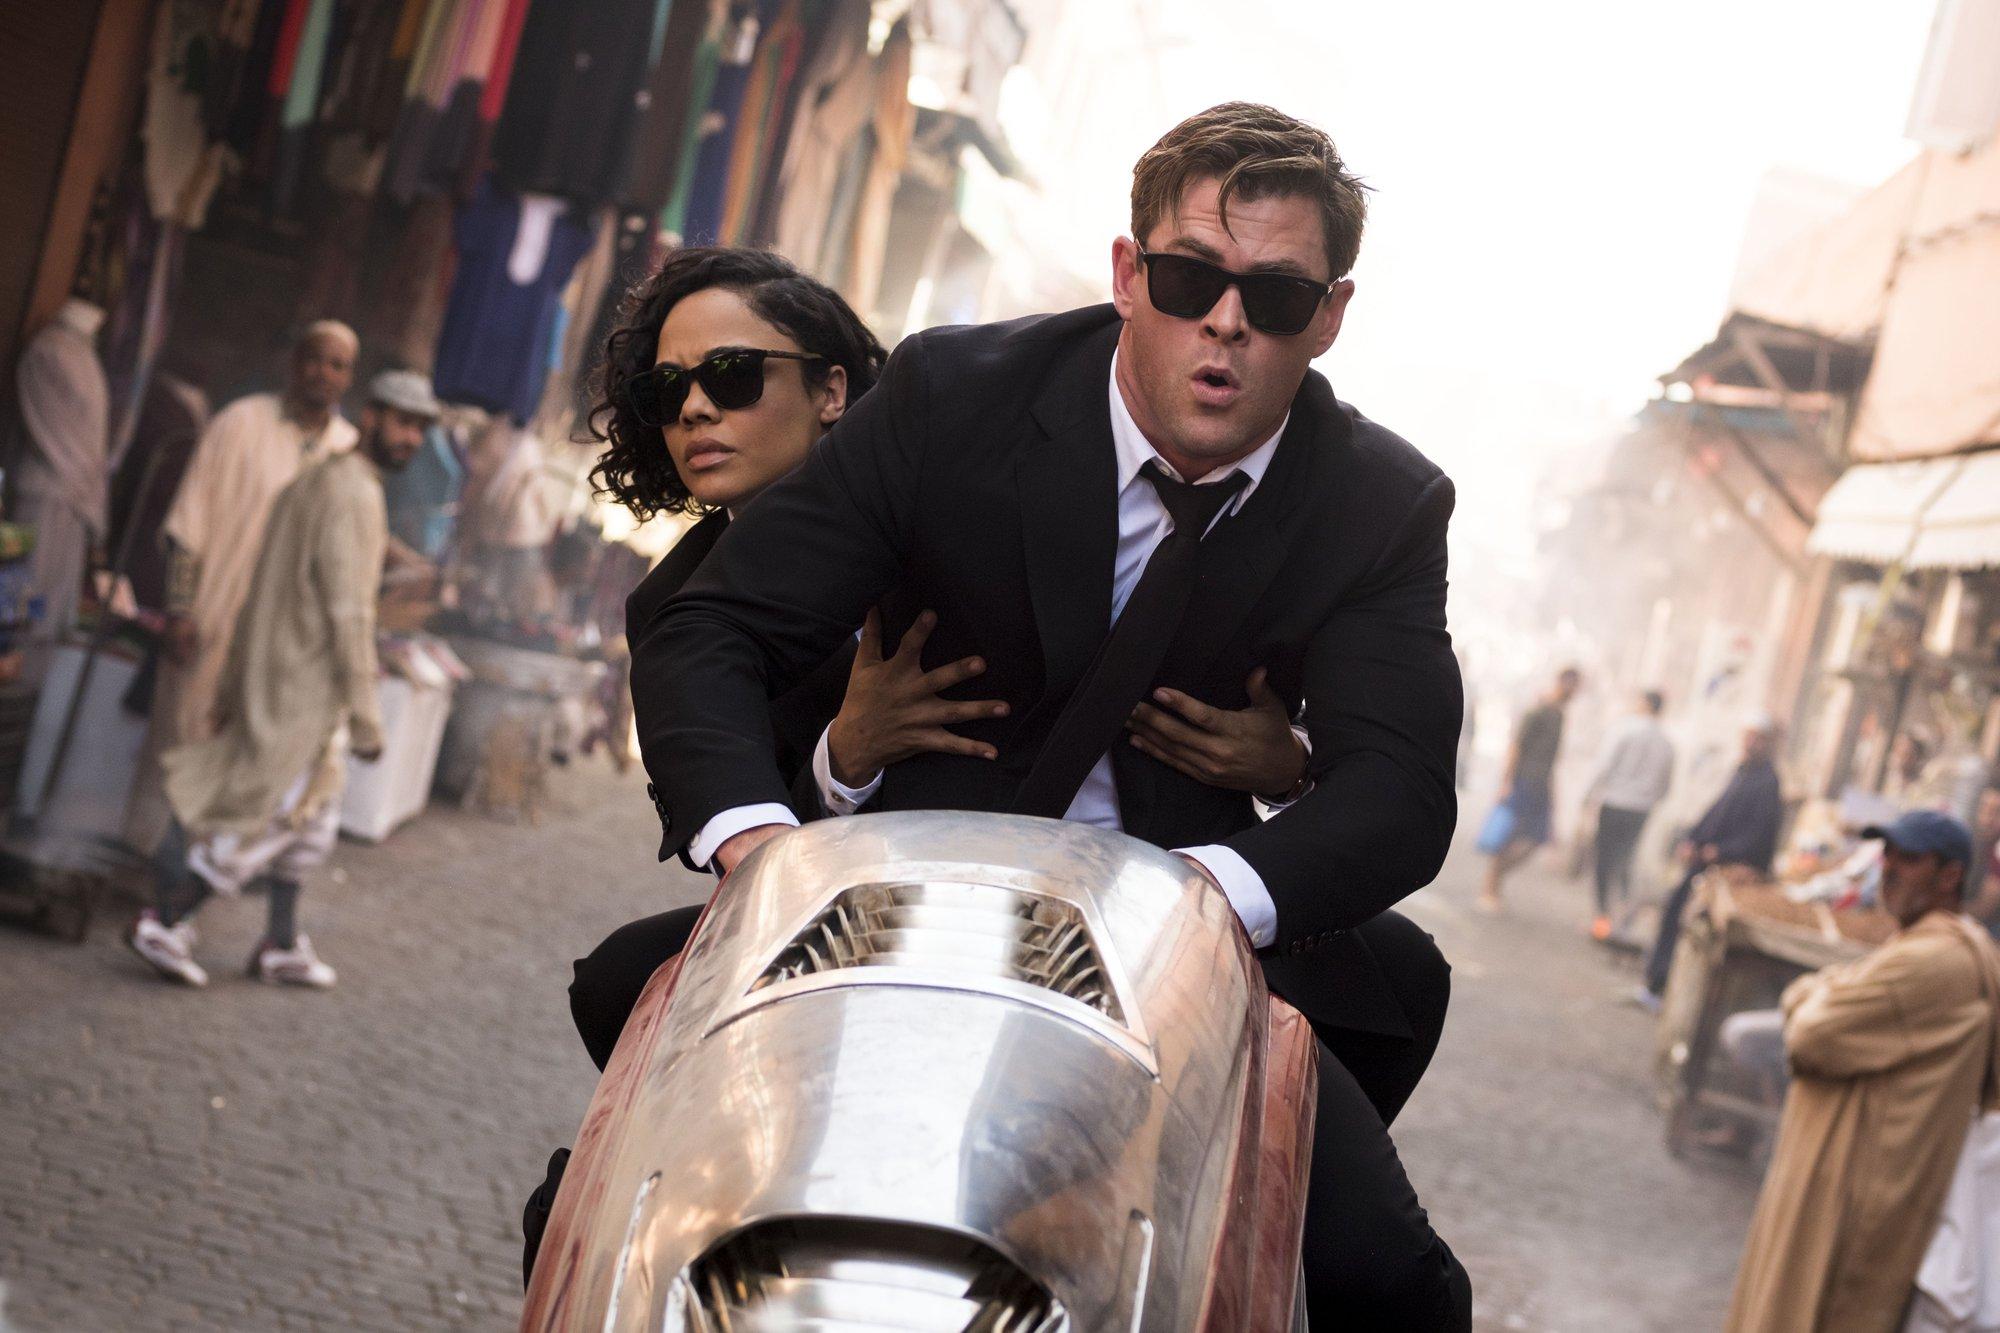 'Men In Black: International' leads North American box office in opening weekend